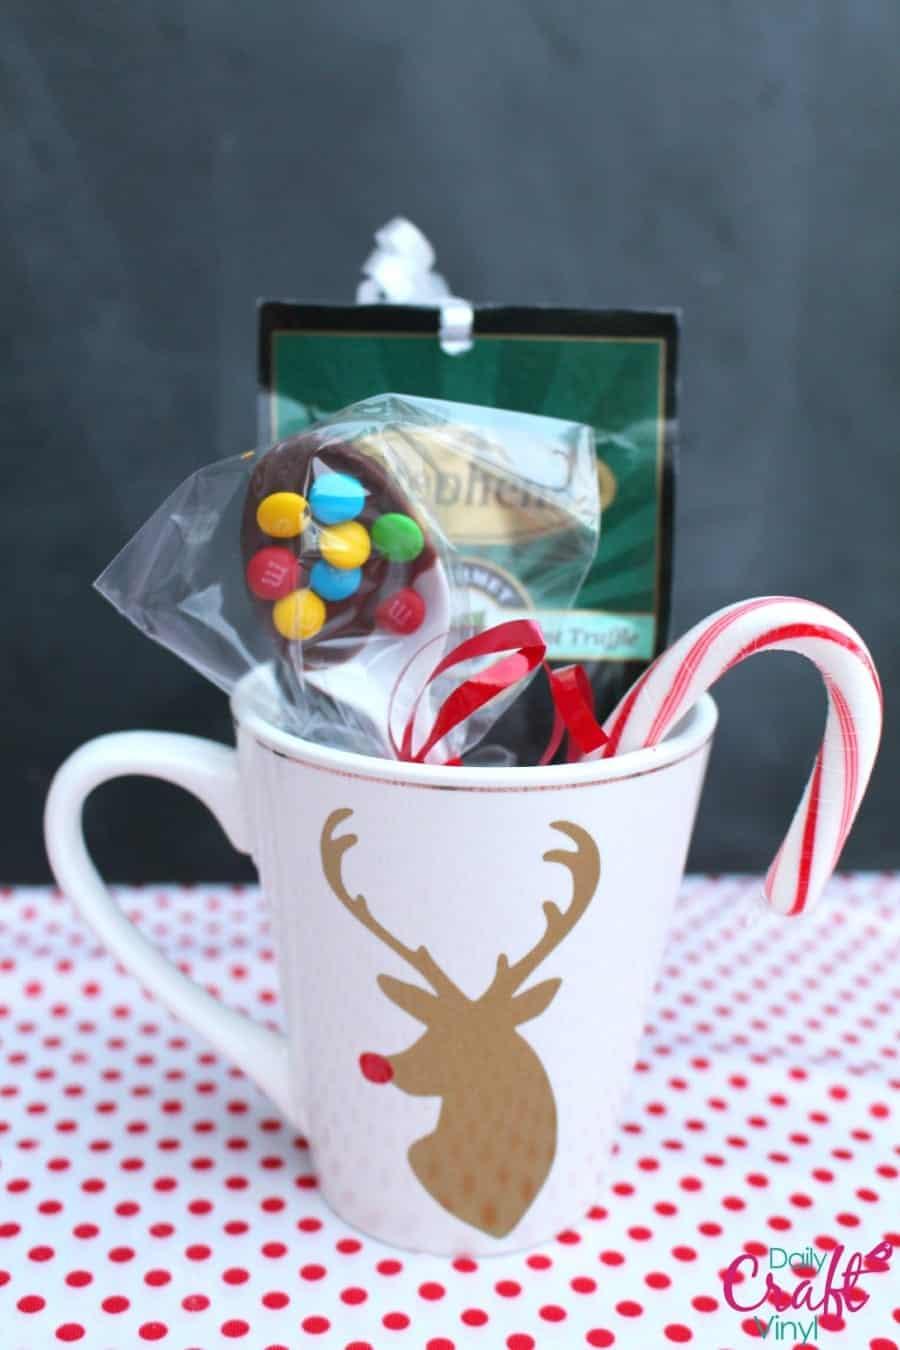 Stephen S Hot Chocolate Neighbor Gift A Girl And A Glue Gun